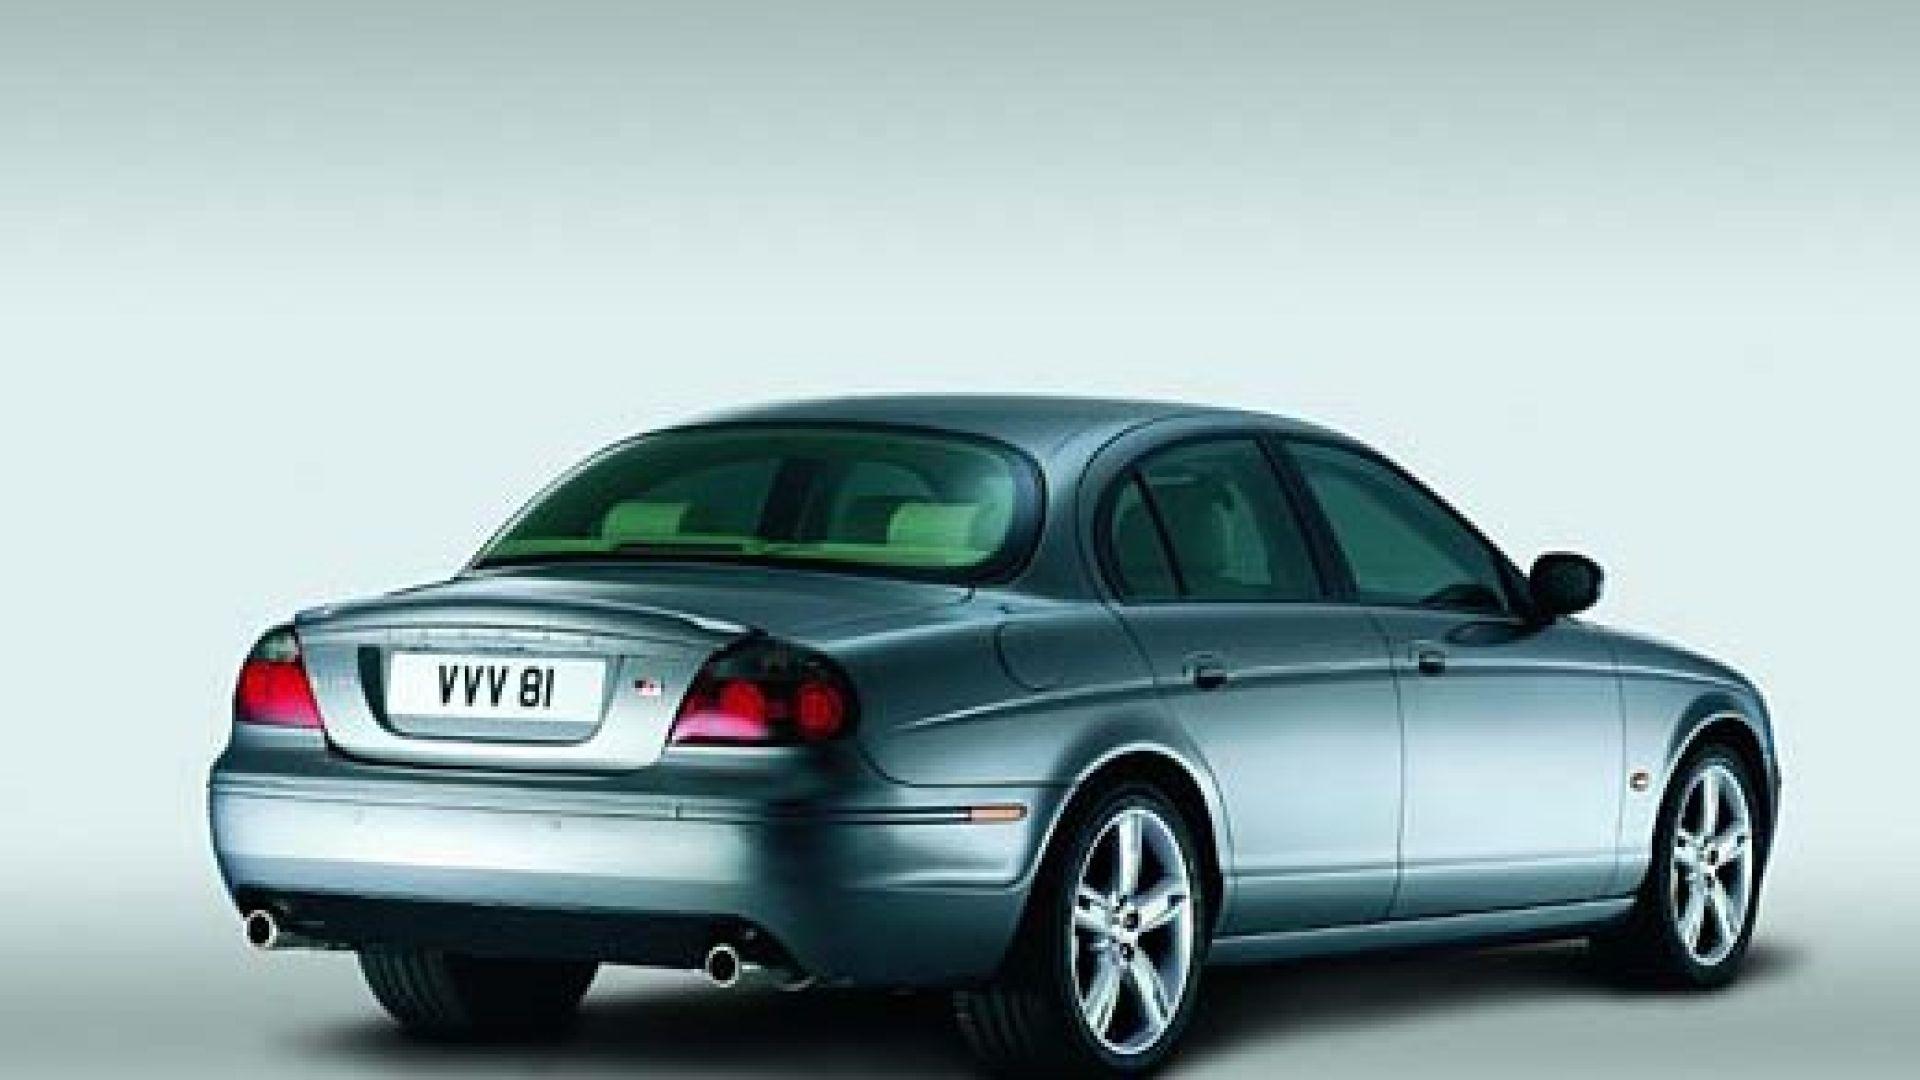 Anteprima:Jaguar S-Type 2004 - MotorBox